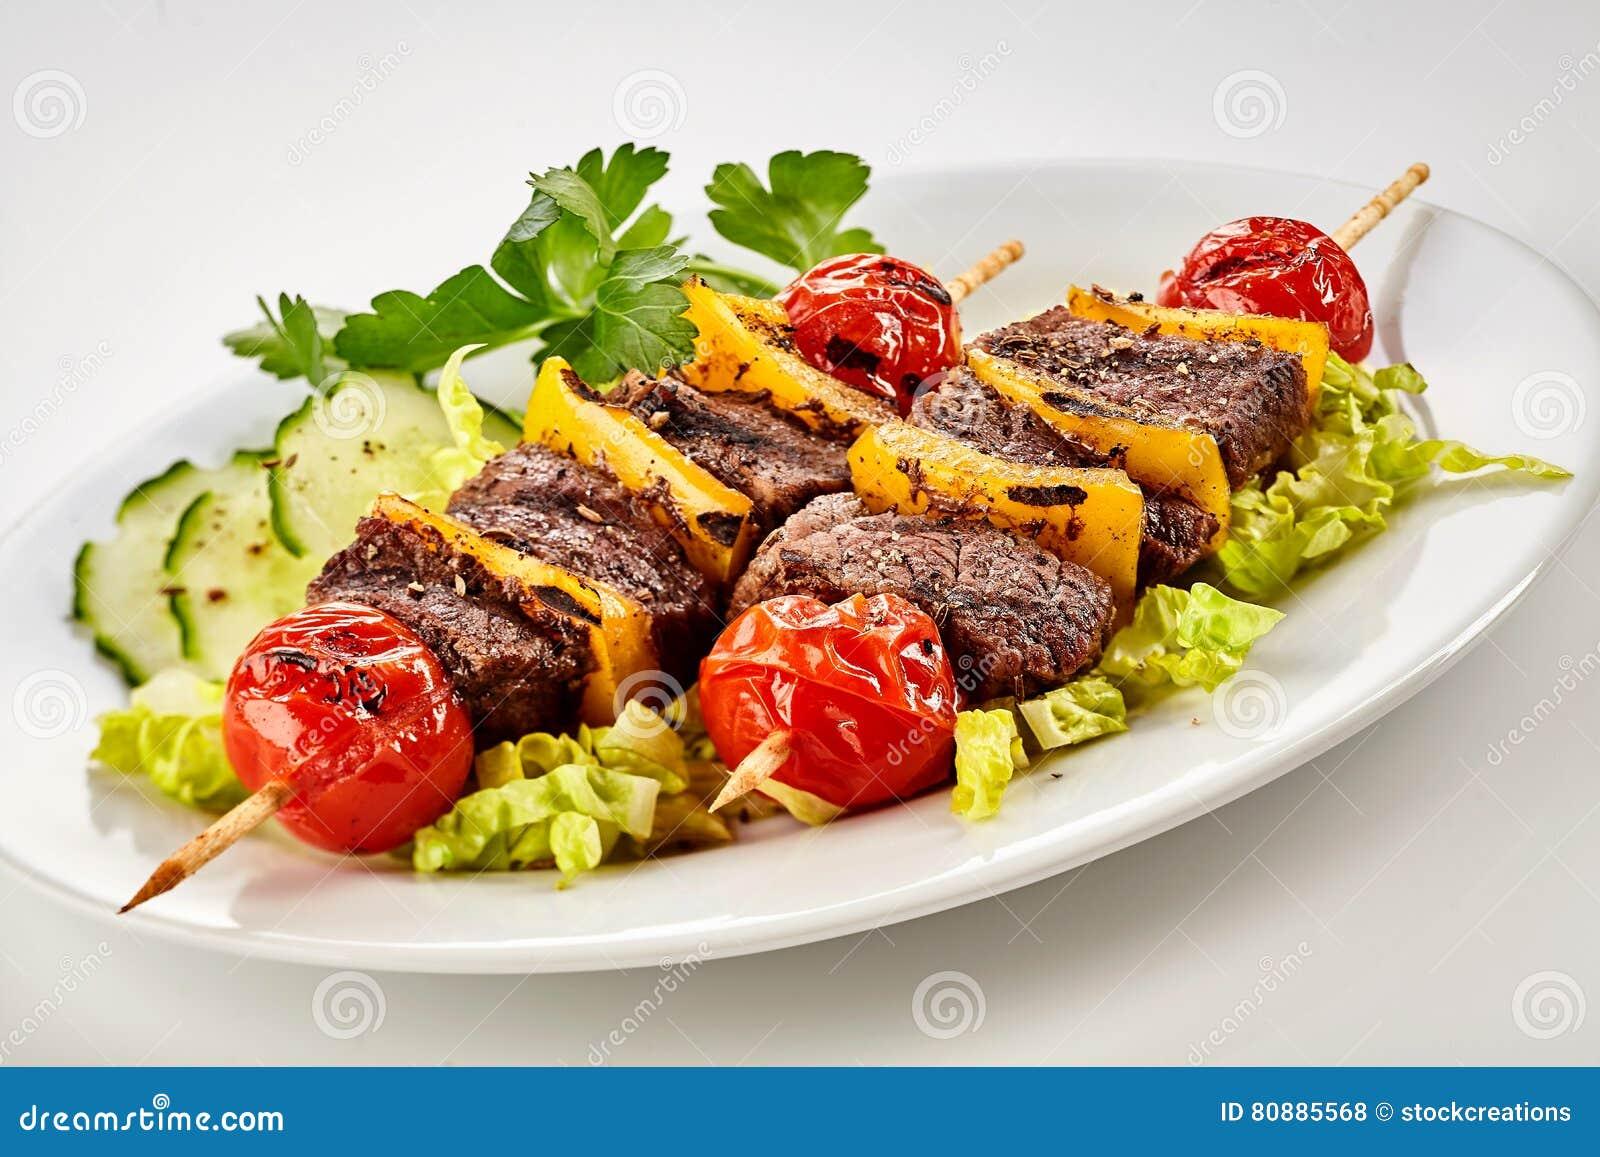 Tasty grilled marinated beef shish kebabs